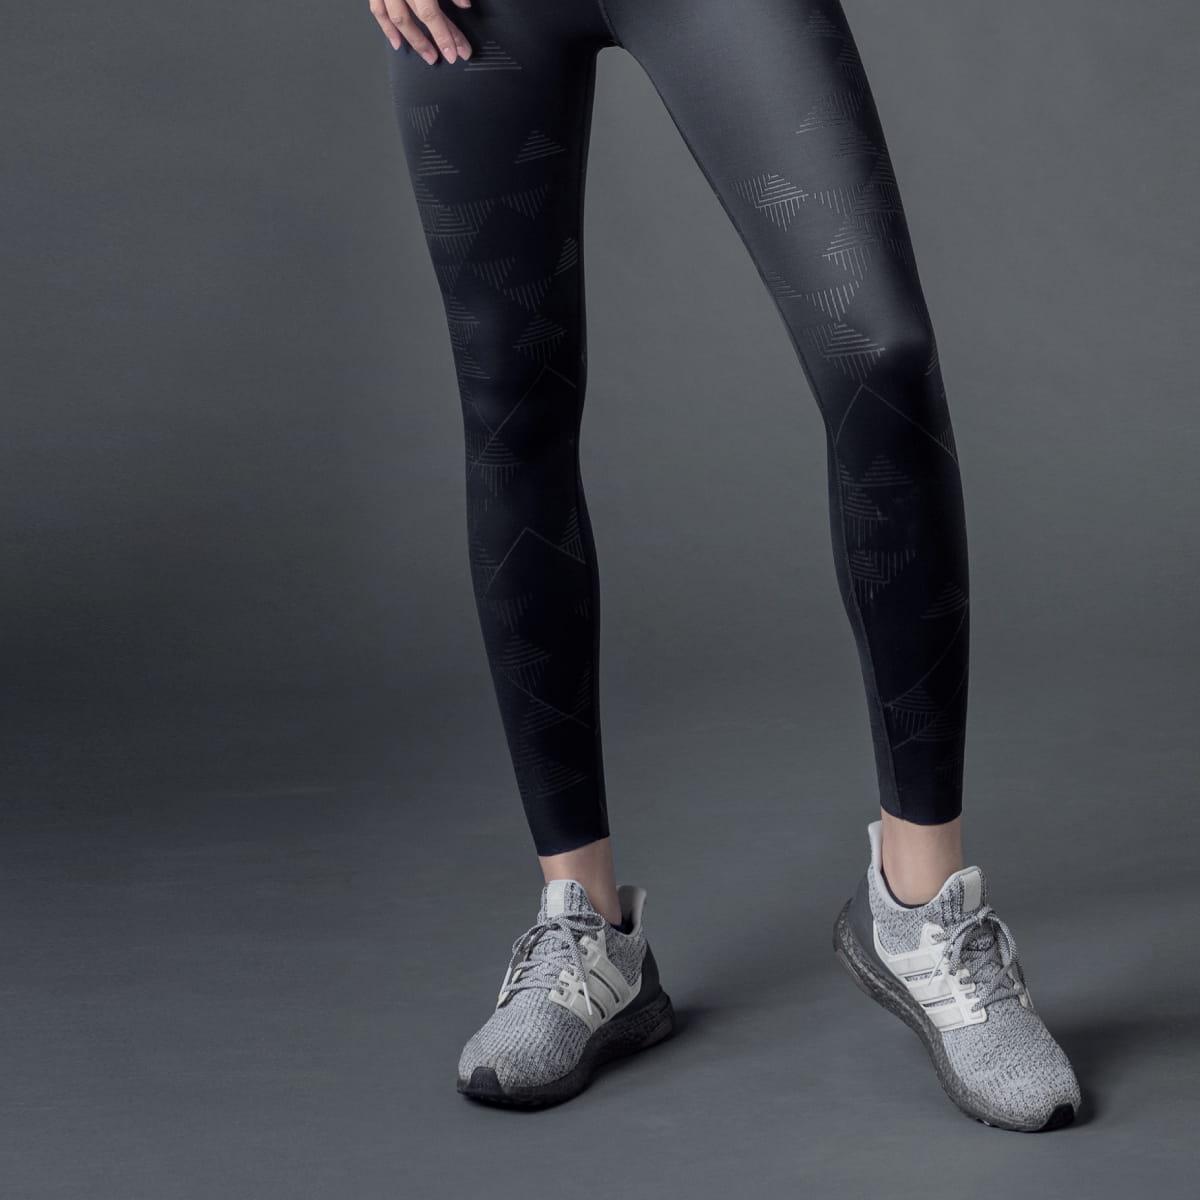 TENO超彈感美型健身褲-Mountain山稜 19